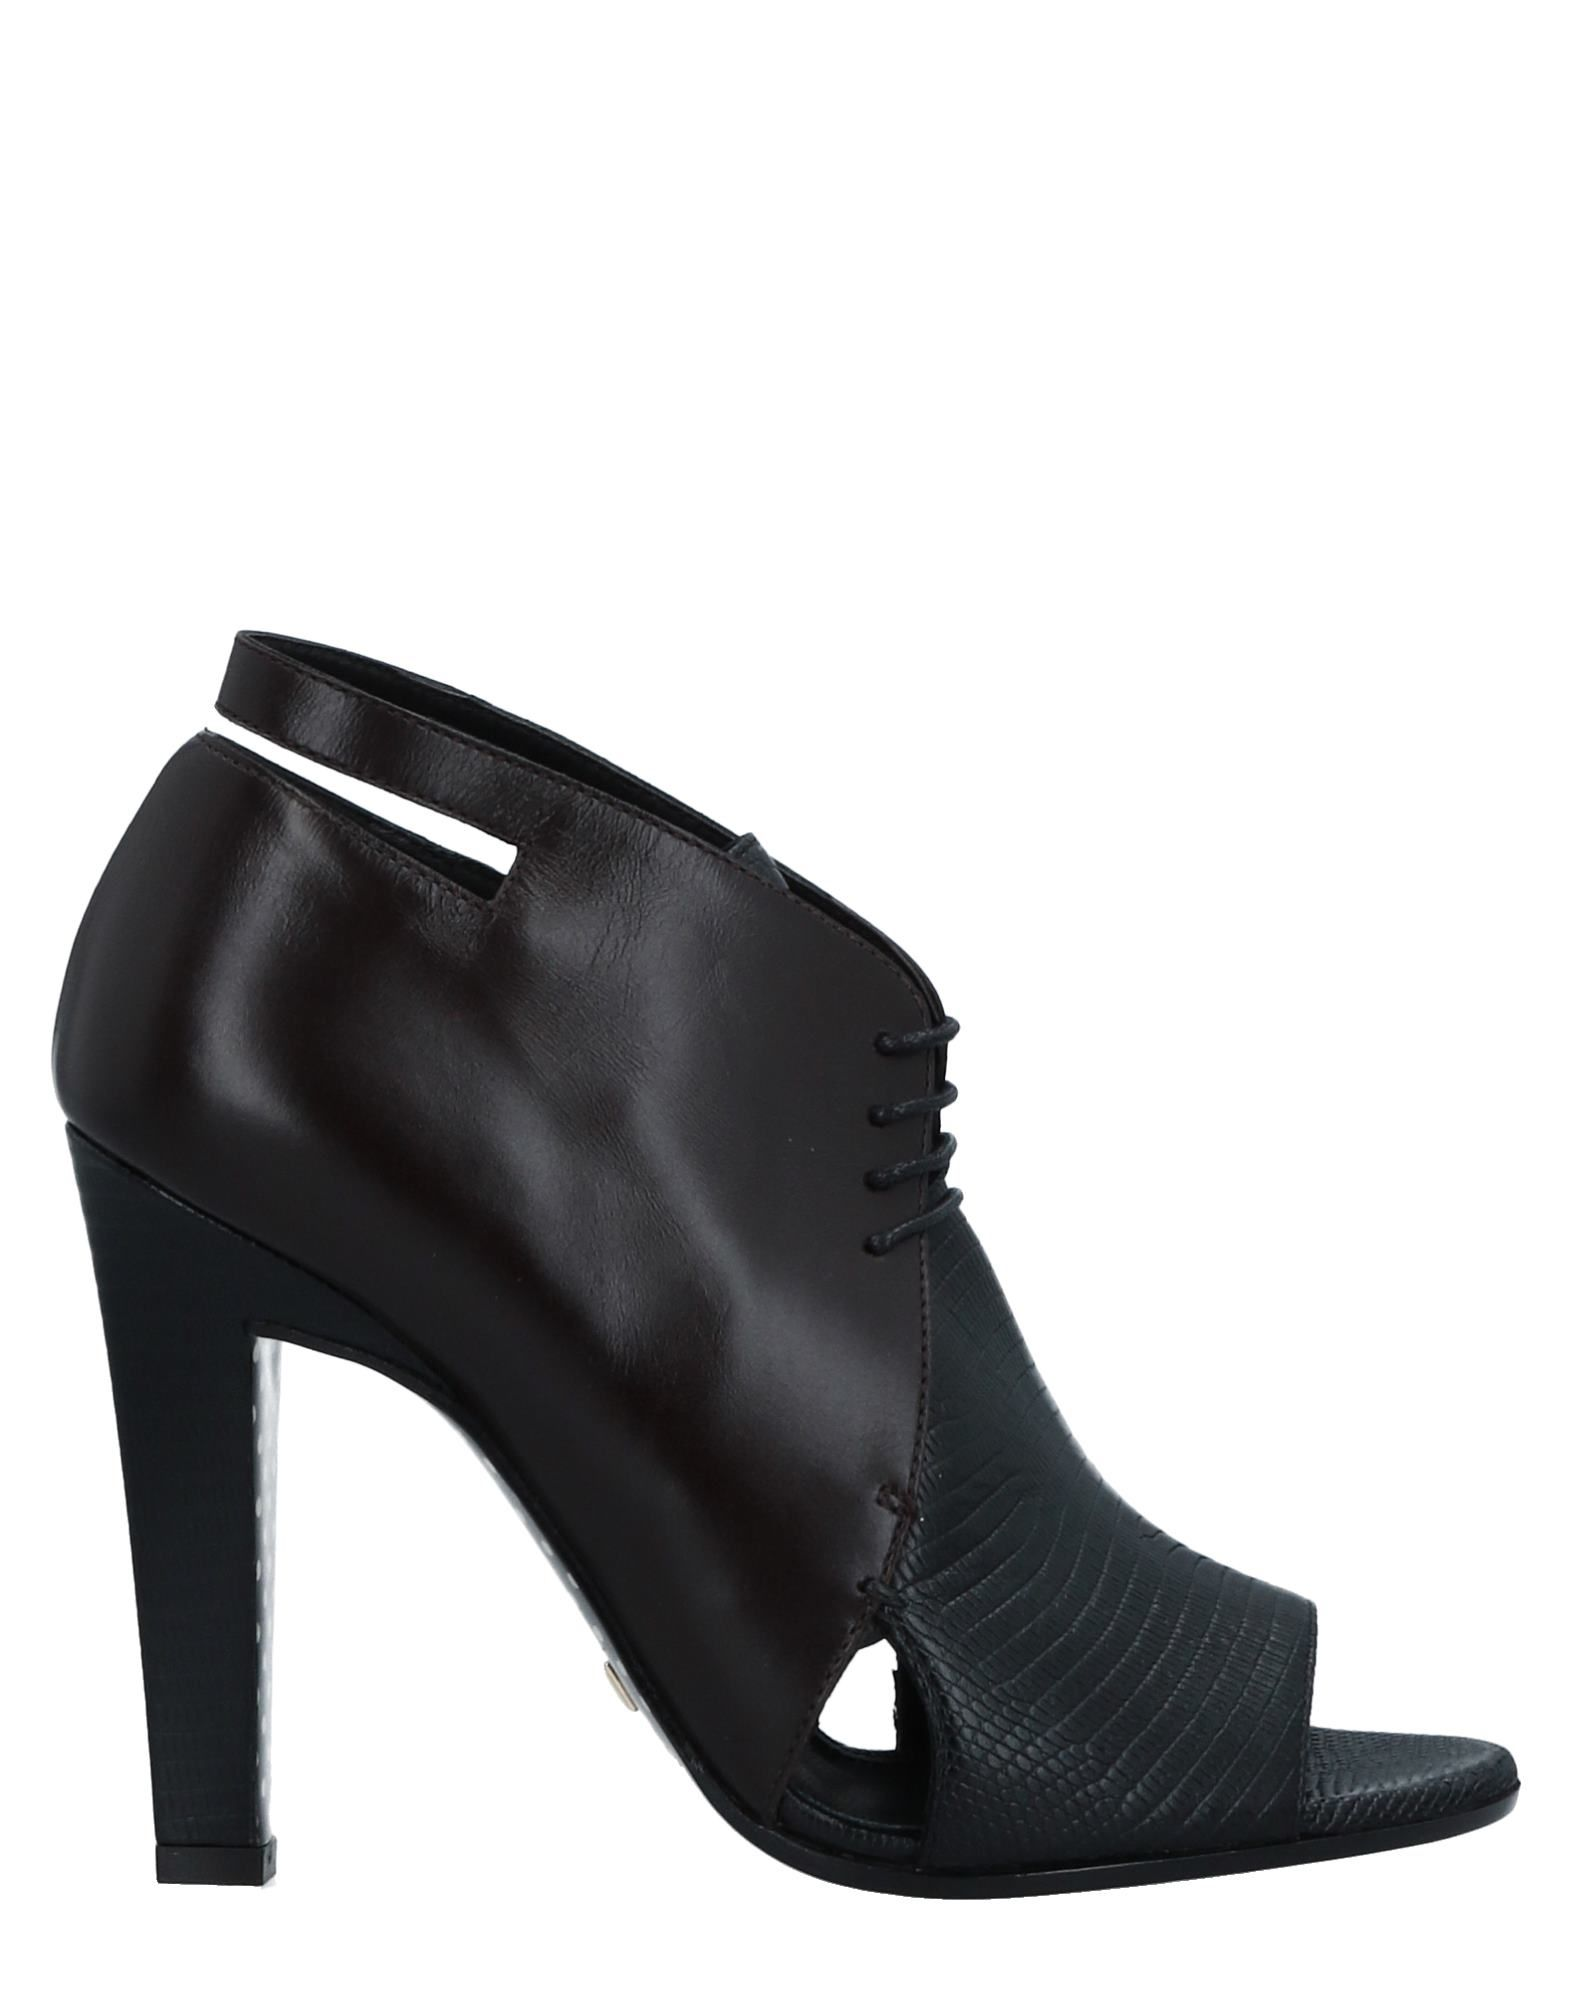 Emanuel Ungaro Stiefelette Stiefelette Ungaro Damen  11518968WL Beliebte Schuhe 10dc67